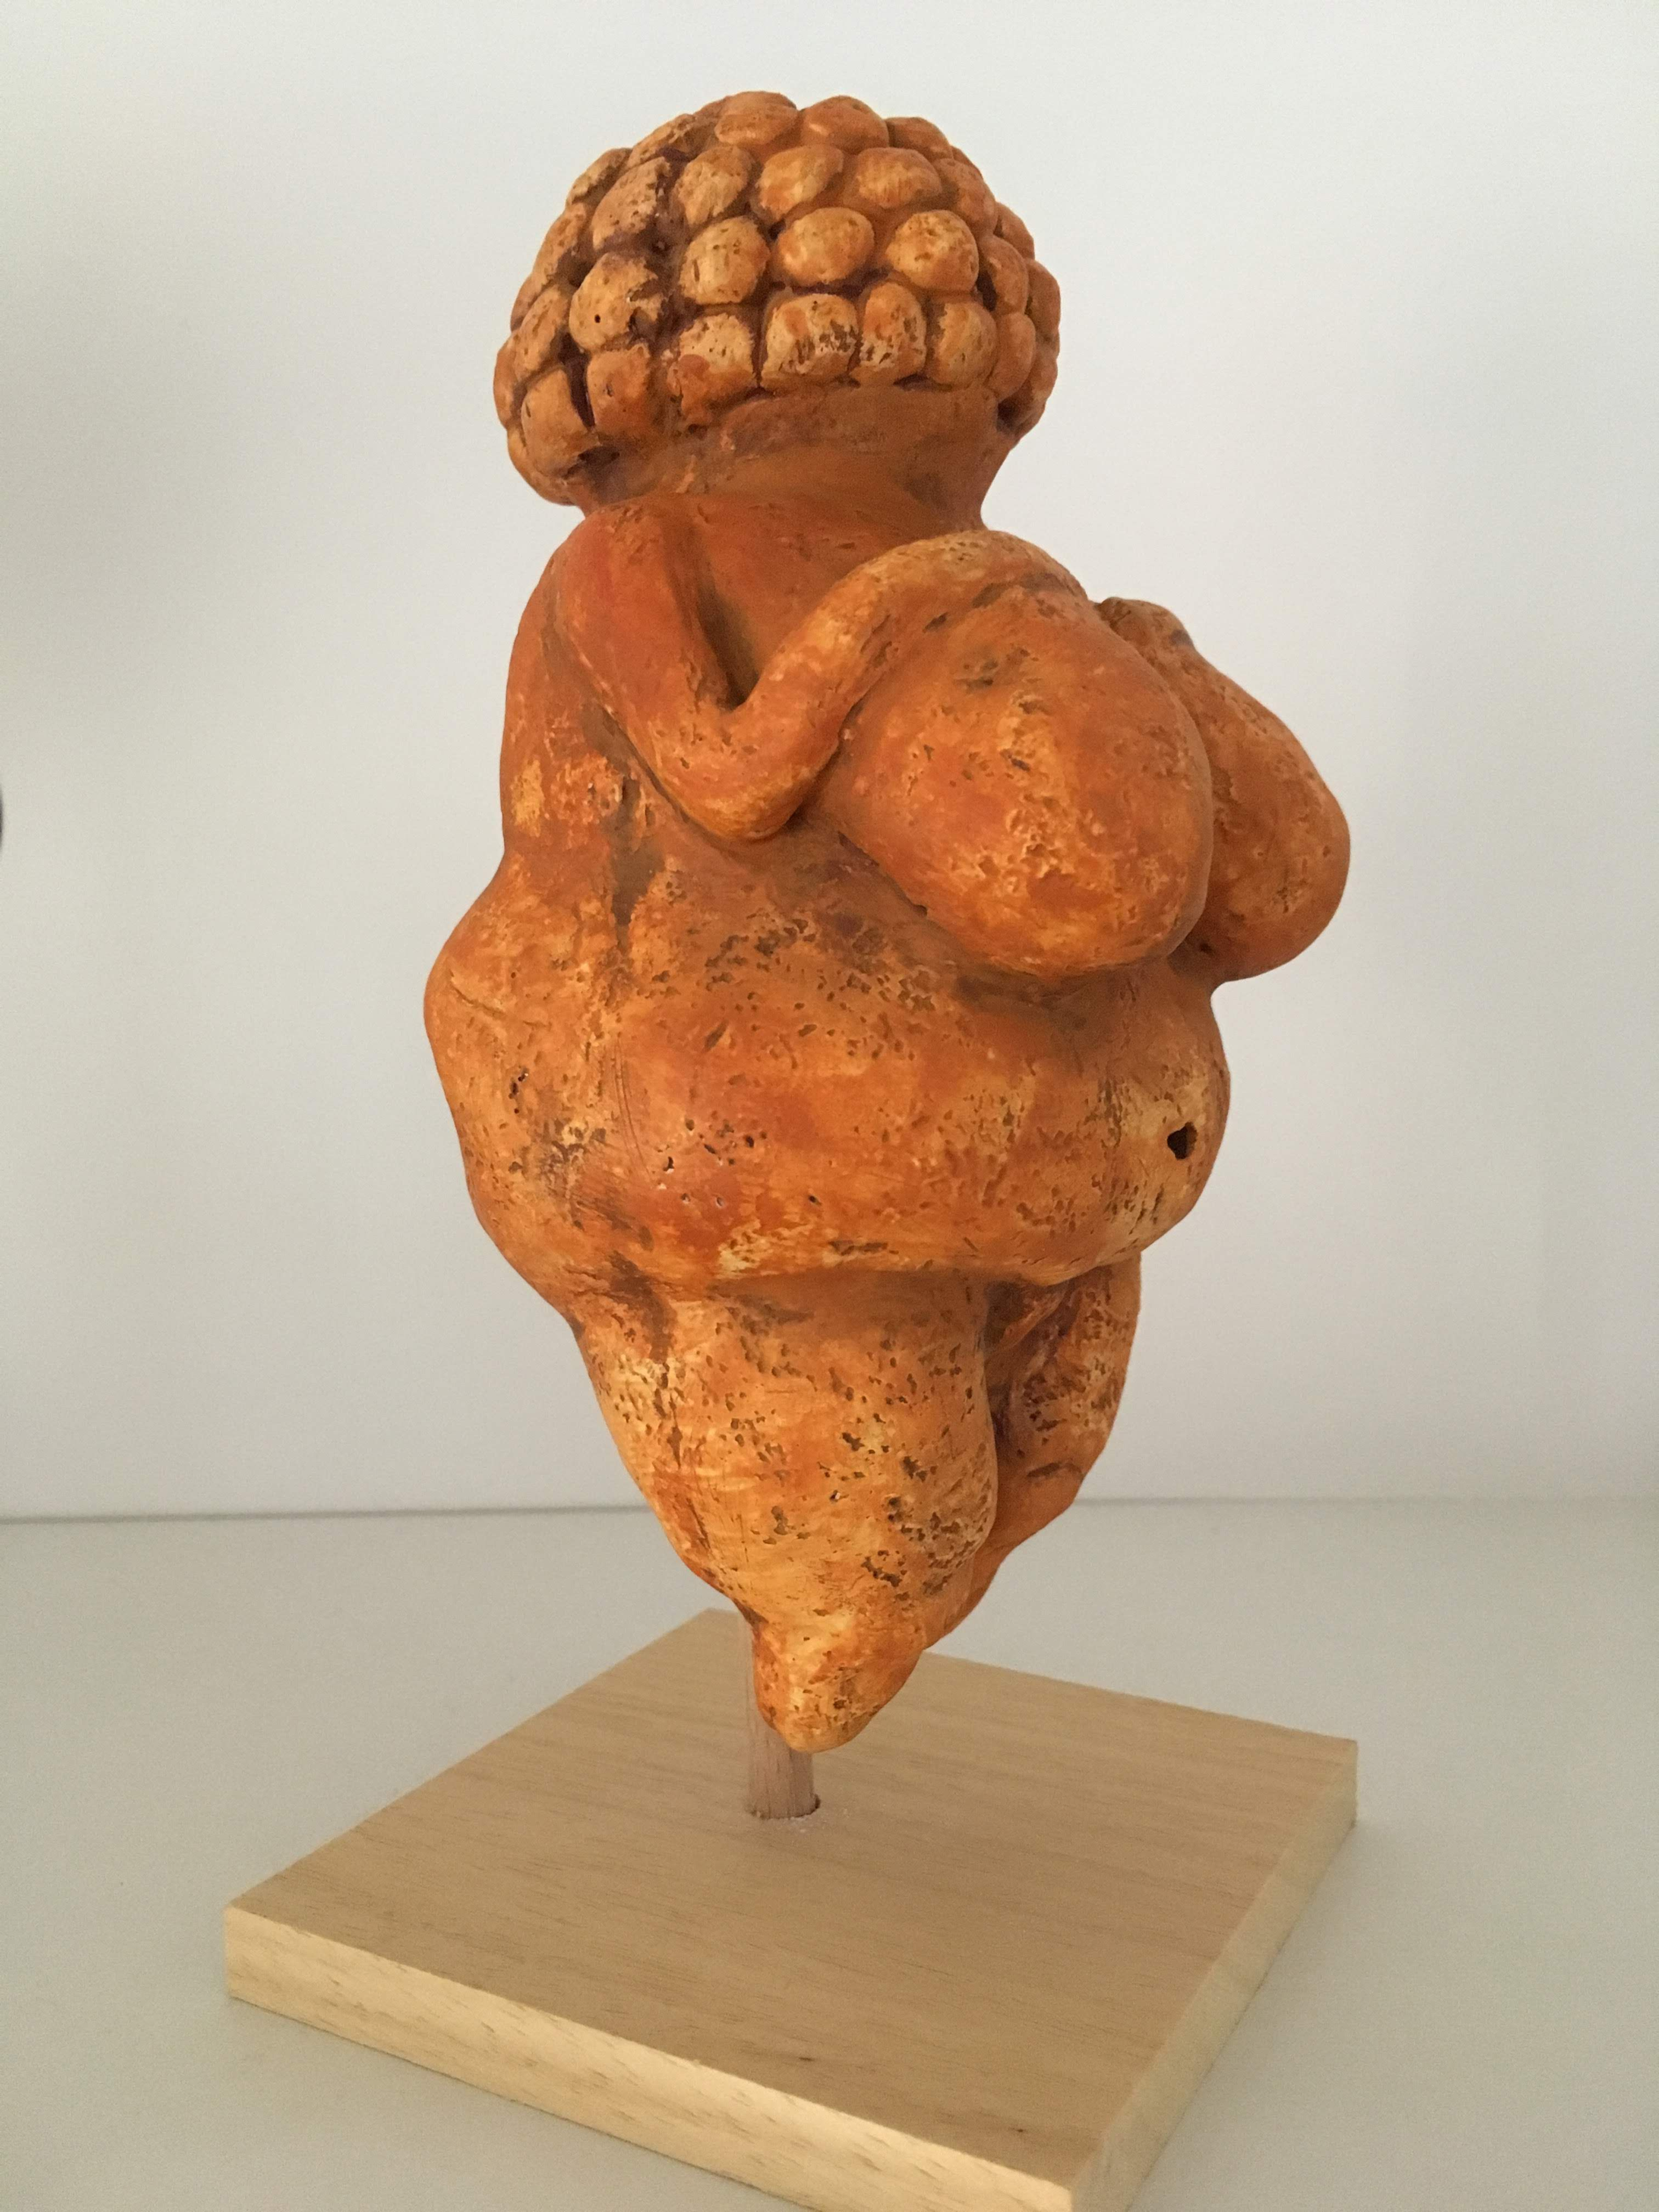 Diosa De La Fertilidad Diosa De La Fertilidad Venus De Willendorf Dioses